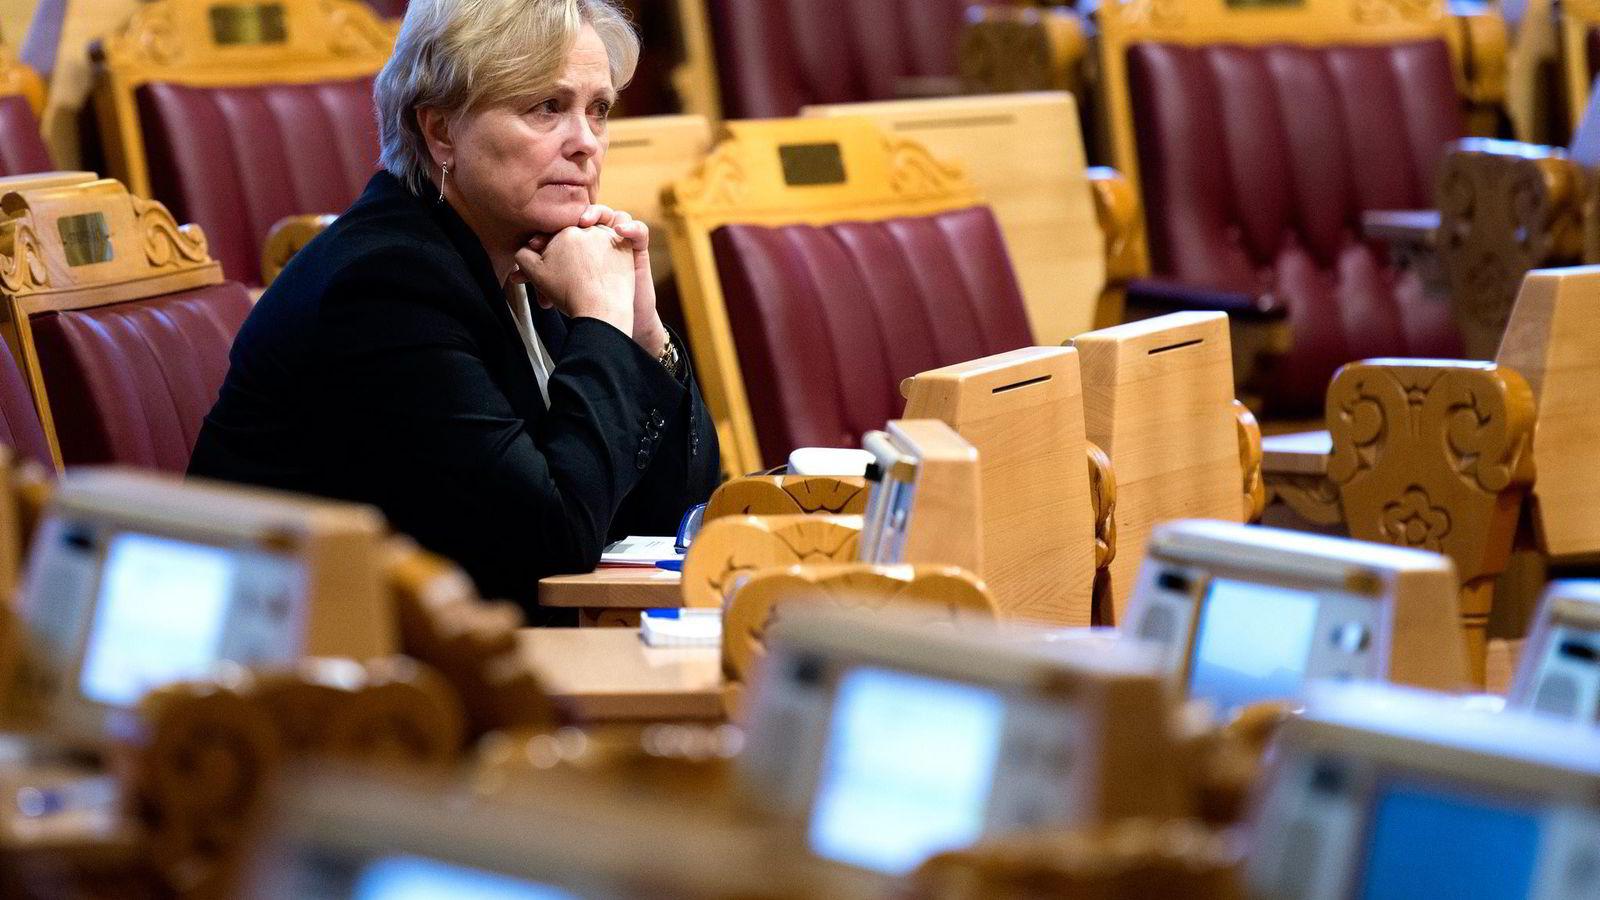 Man kan undres om kulturminister Thorhild Widvey har glemt sin ombudsmannsrolle, skriver artikkelforfatteren. Her Thorhild Widvey under spørretimen i Stortinget.